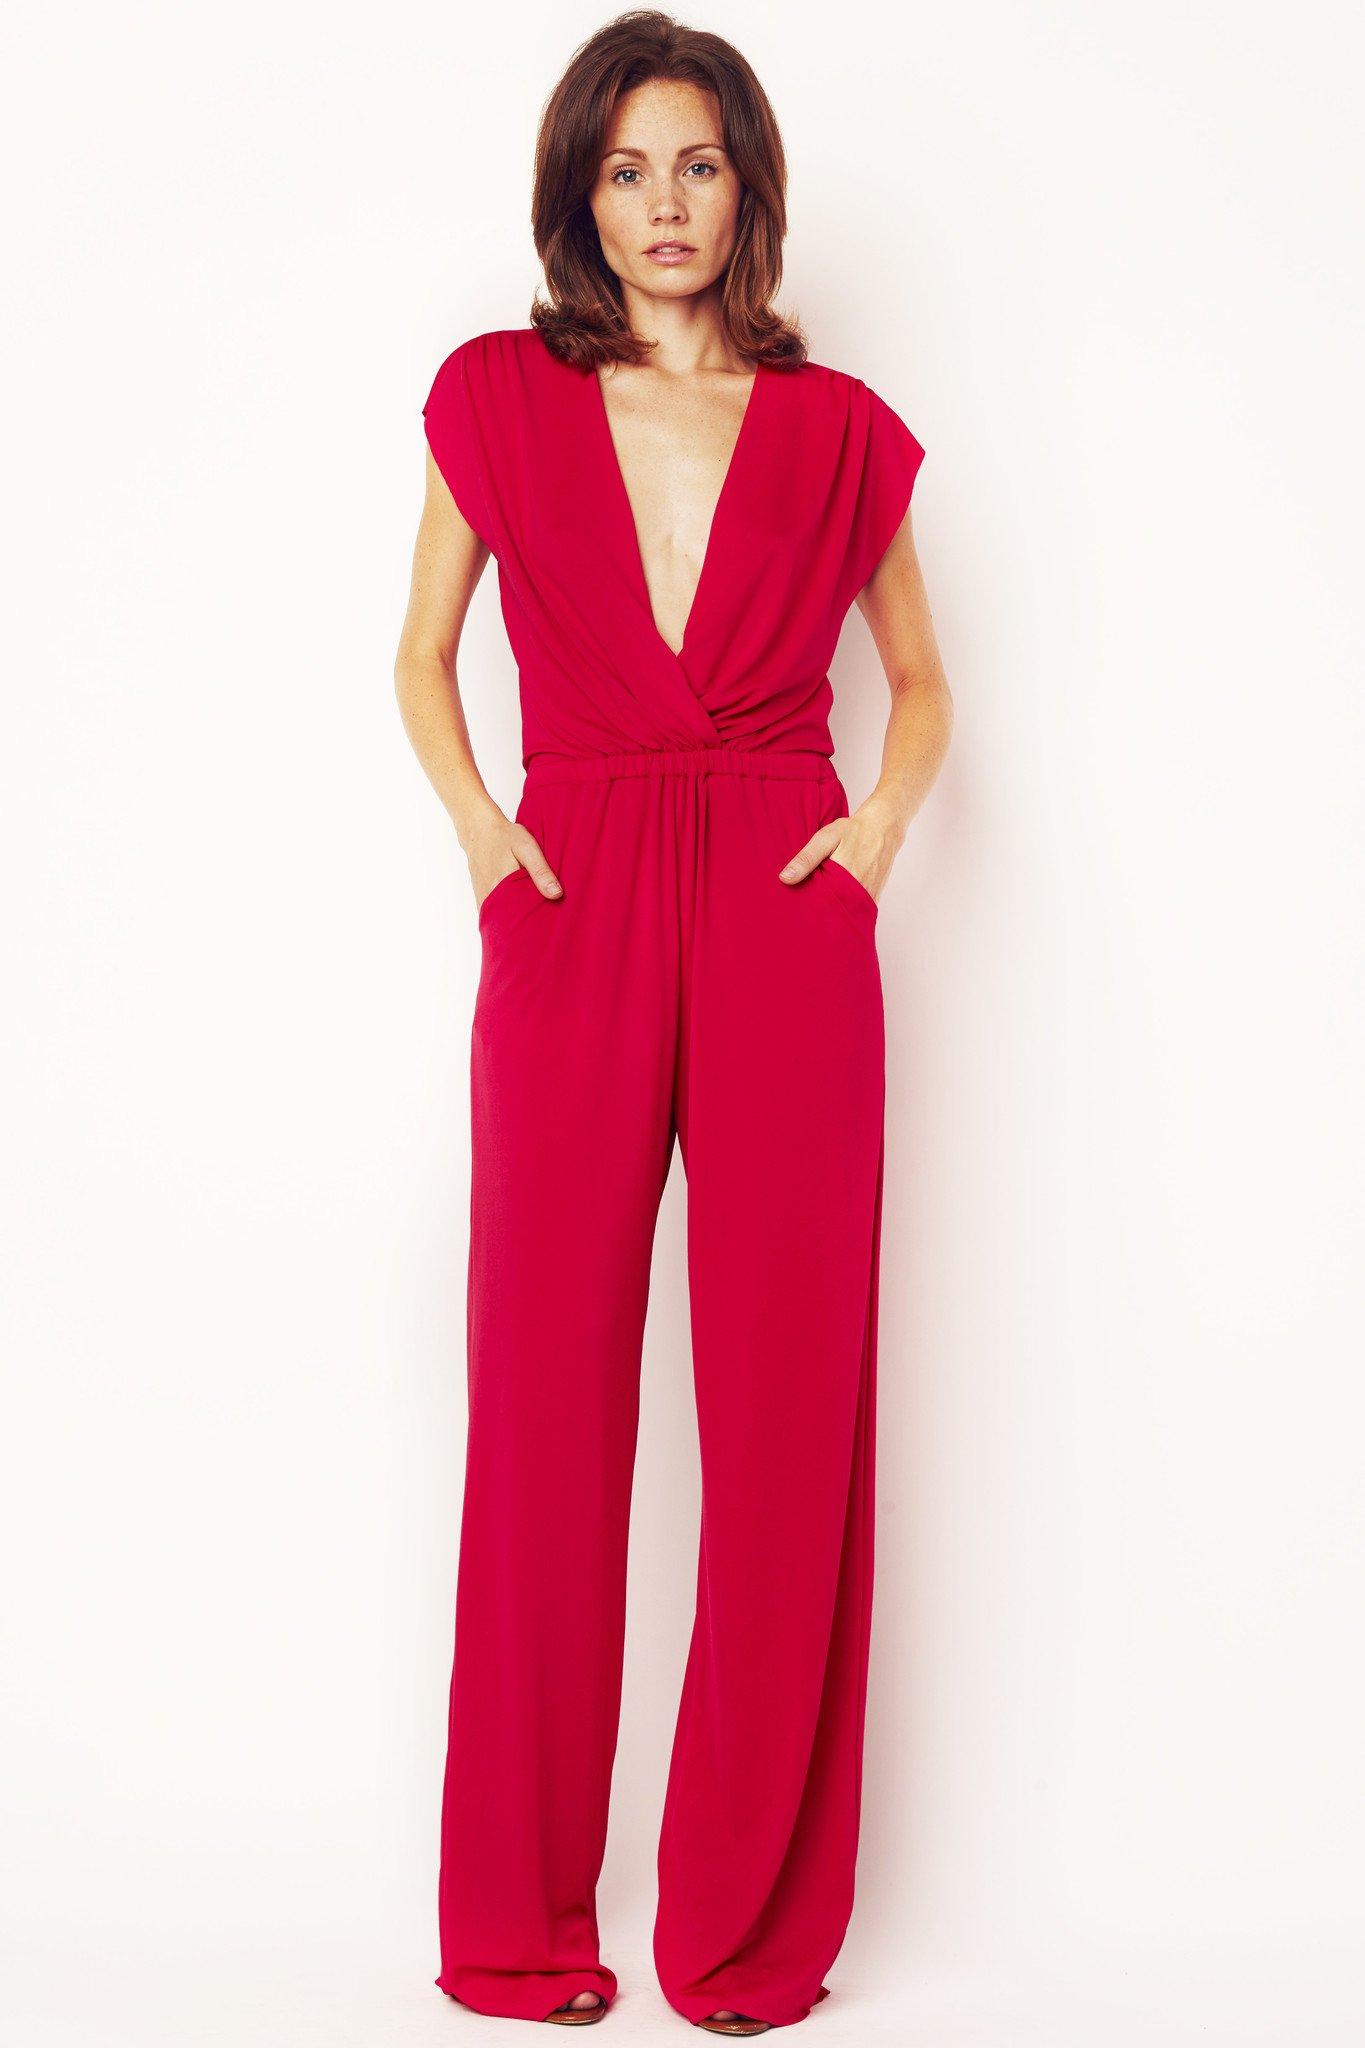 hot pink jumpsuit - classic kvagcwf